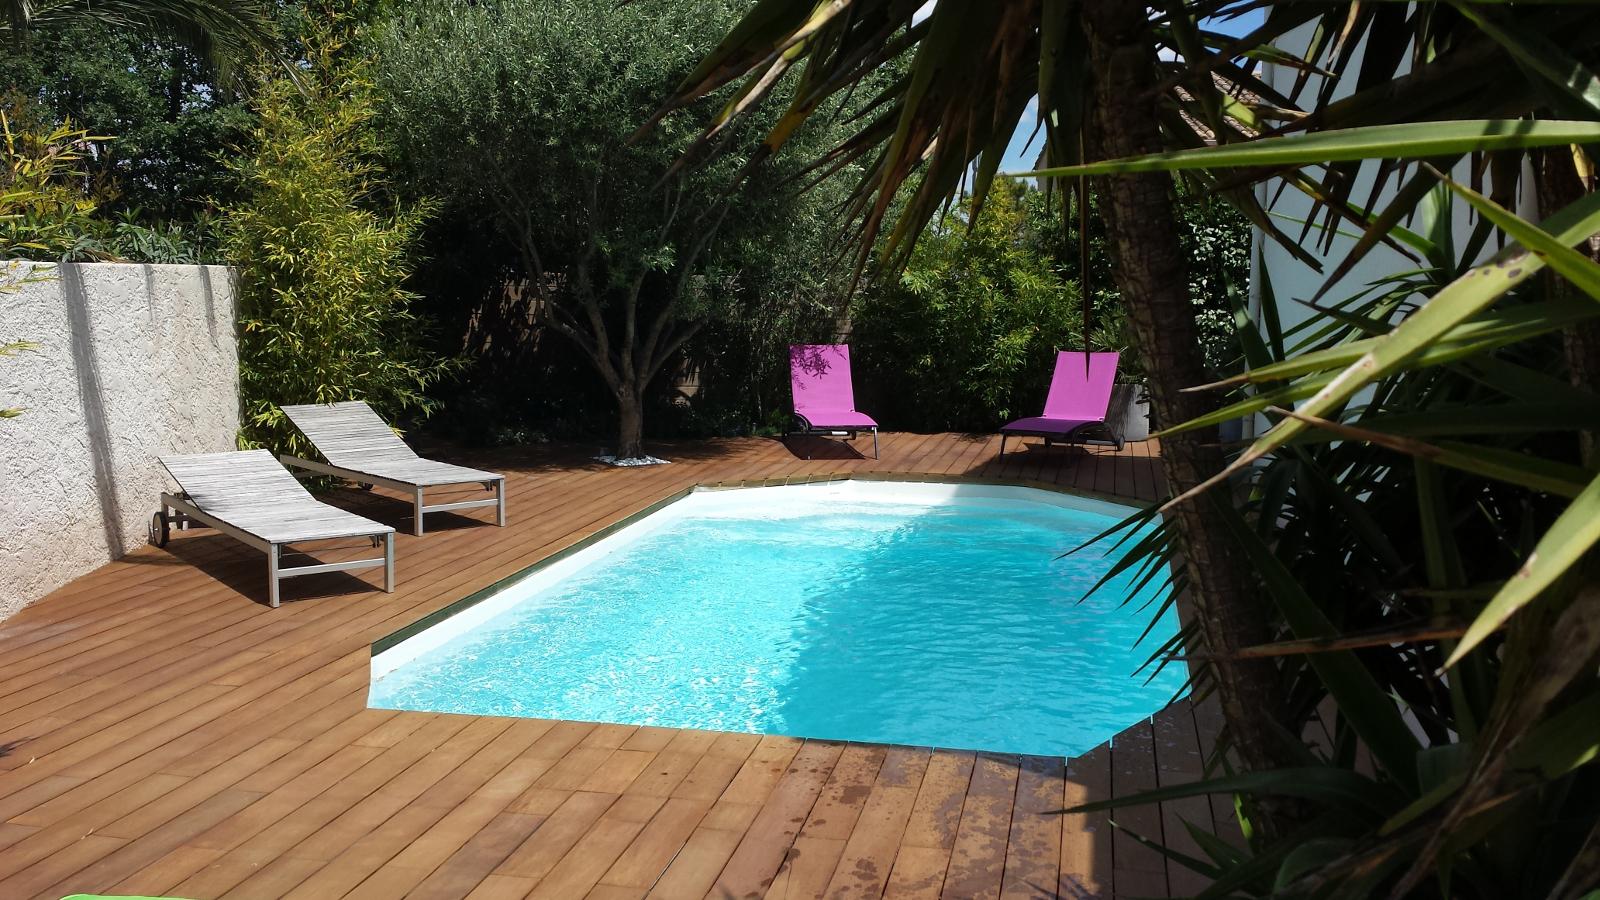 perle 7 install e sur cuers alliance piscines toulon. Black Bedroom Furniture Sets. Home Design Ideas